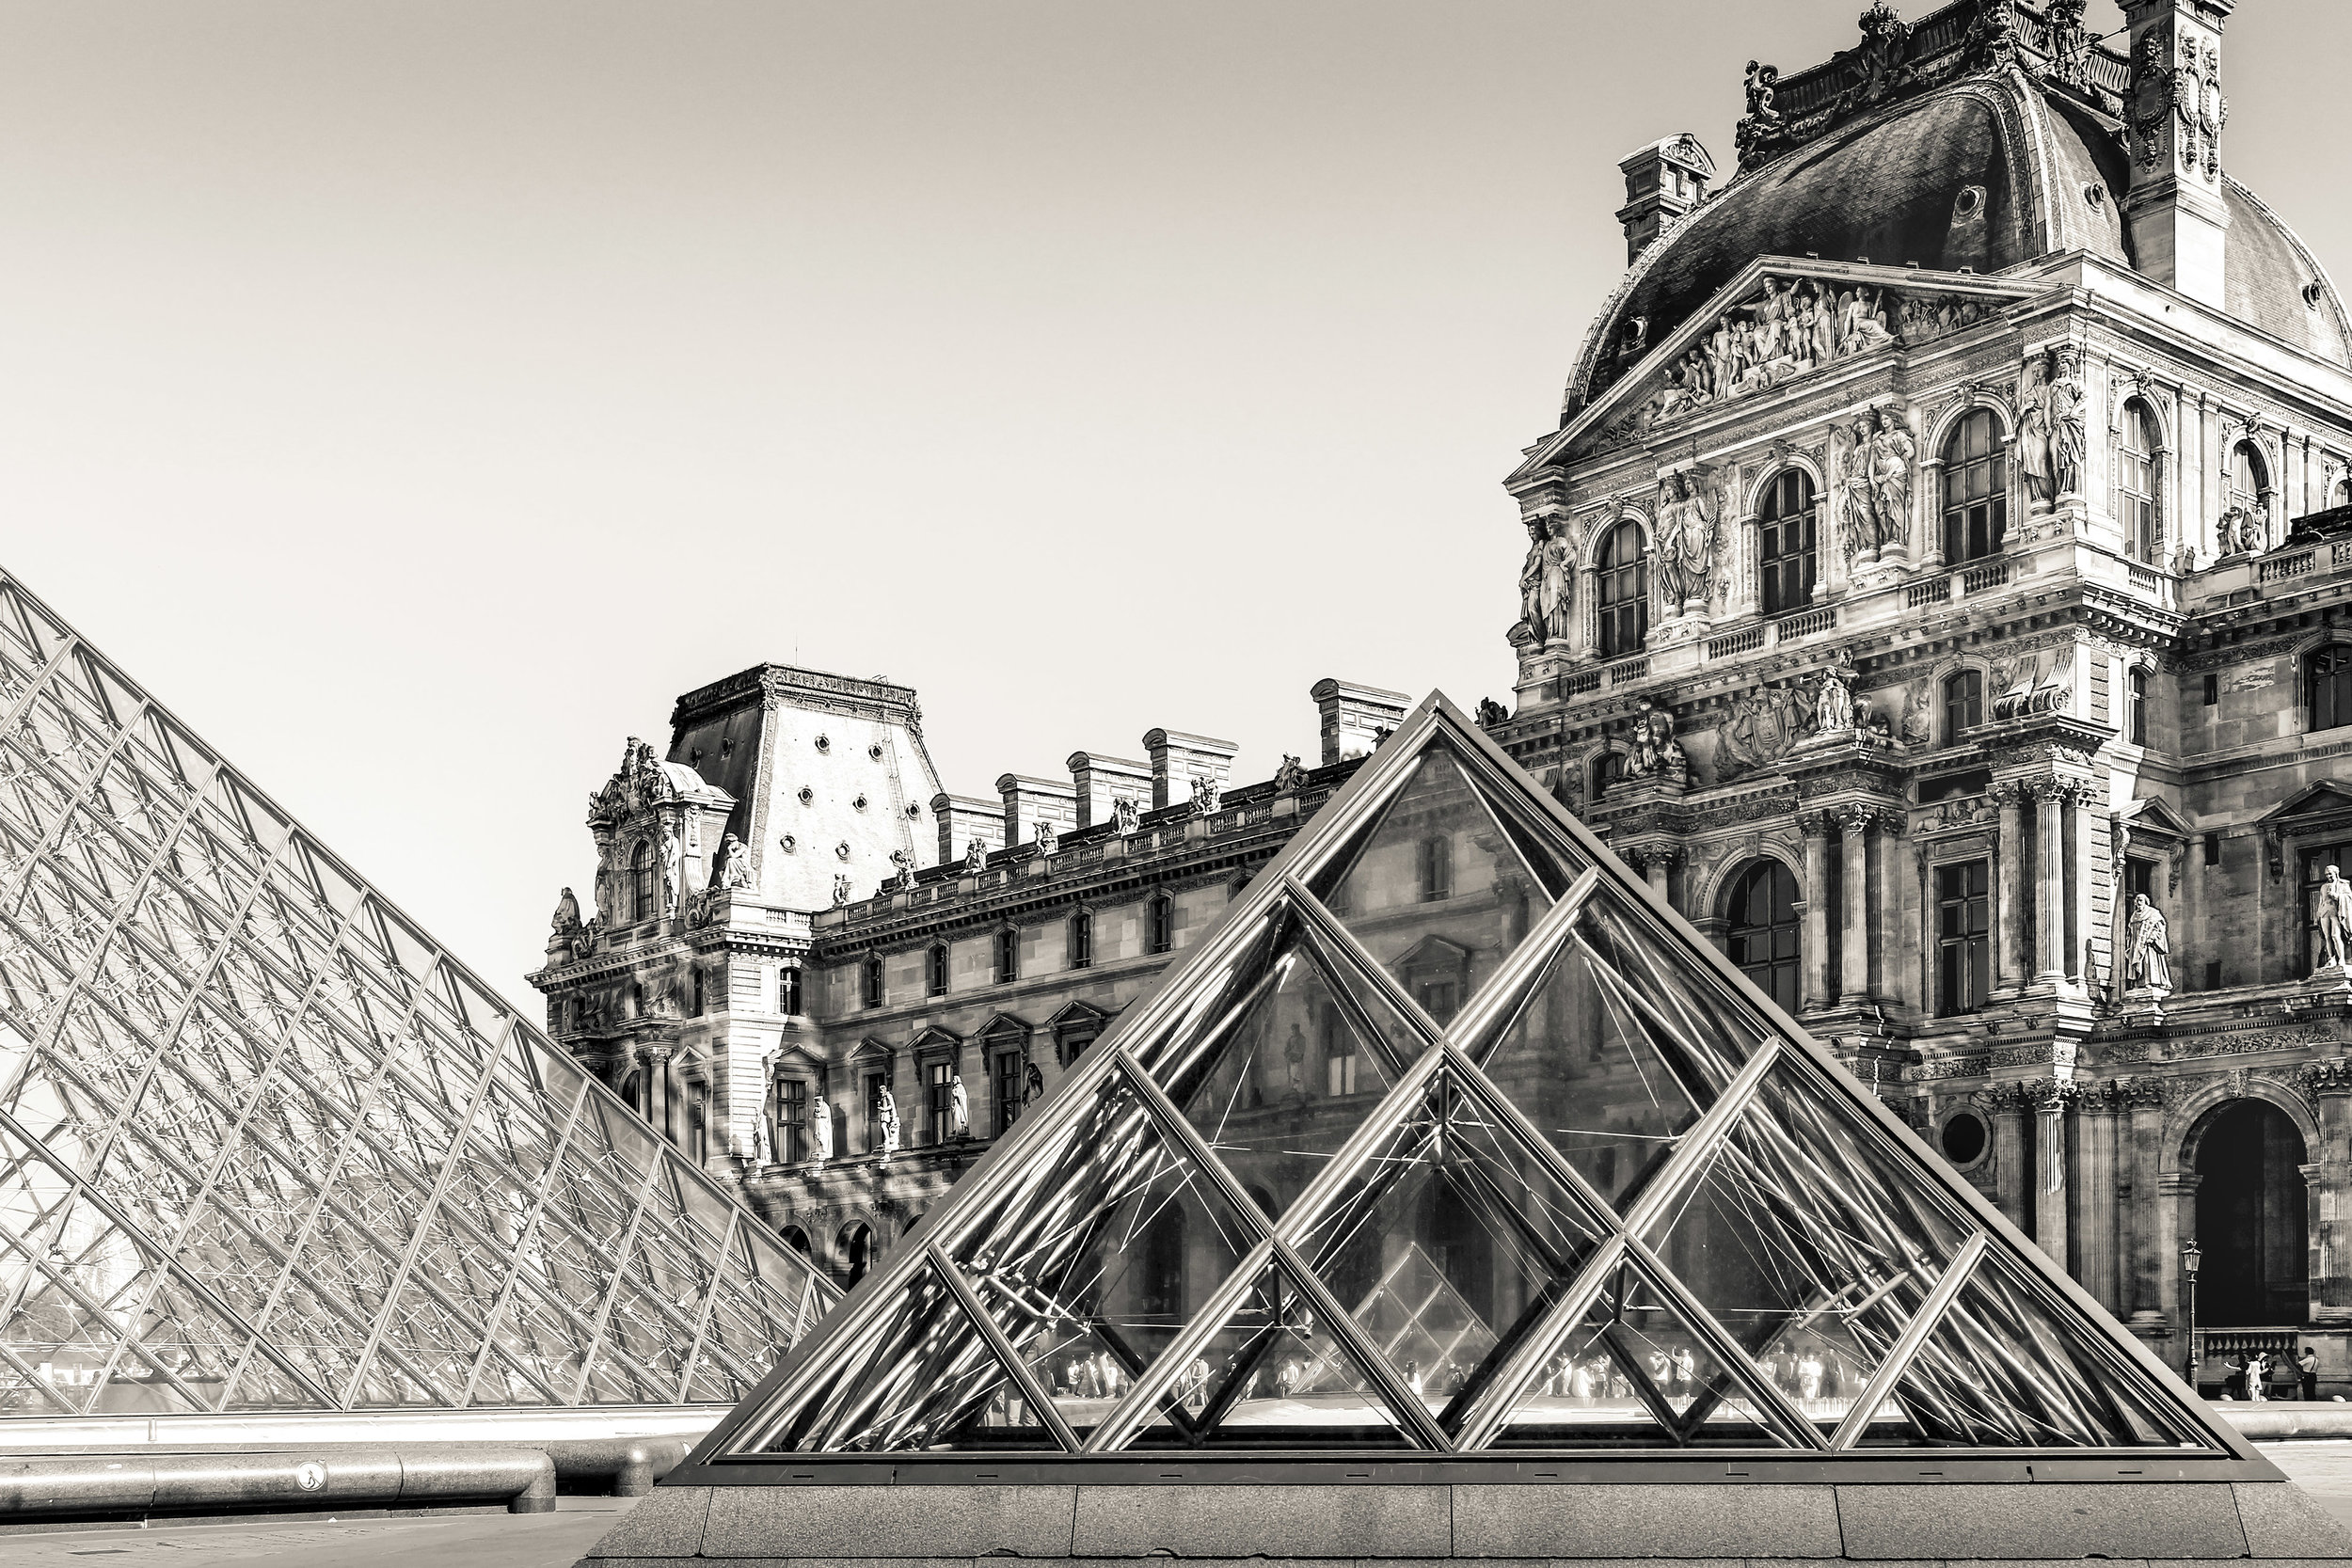 2015 The Louvre 72dpi.jpg